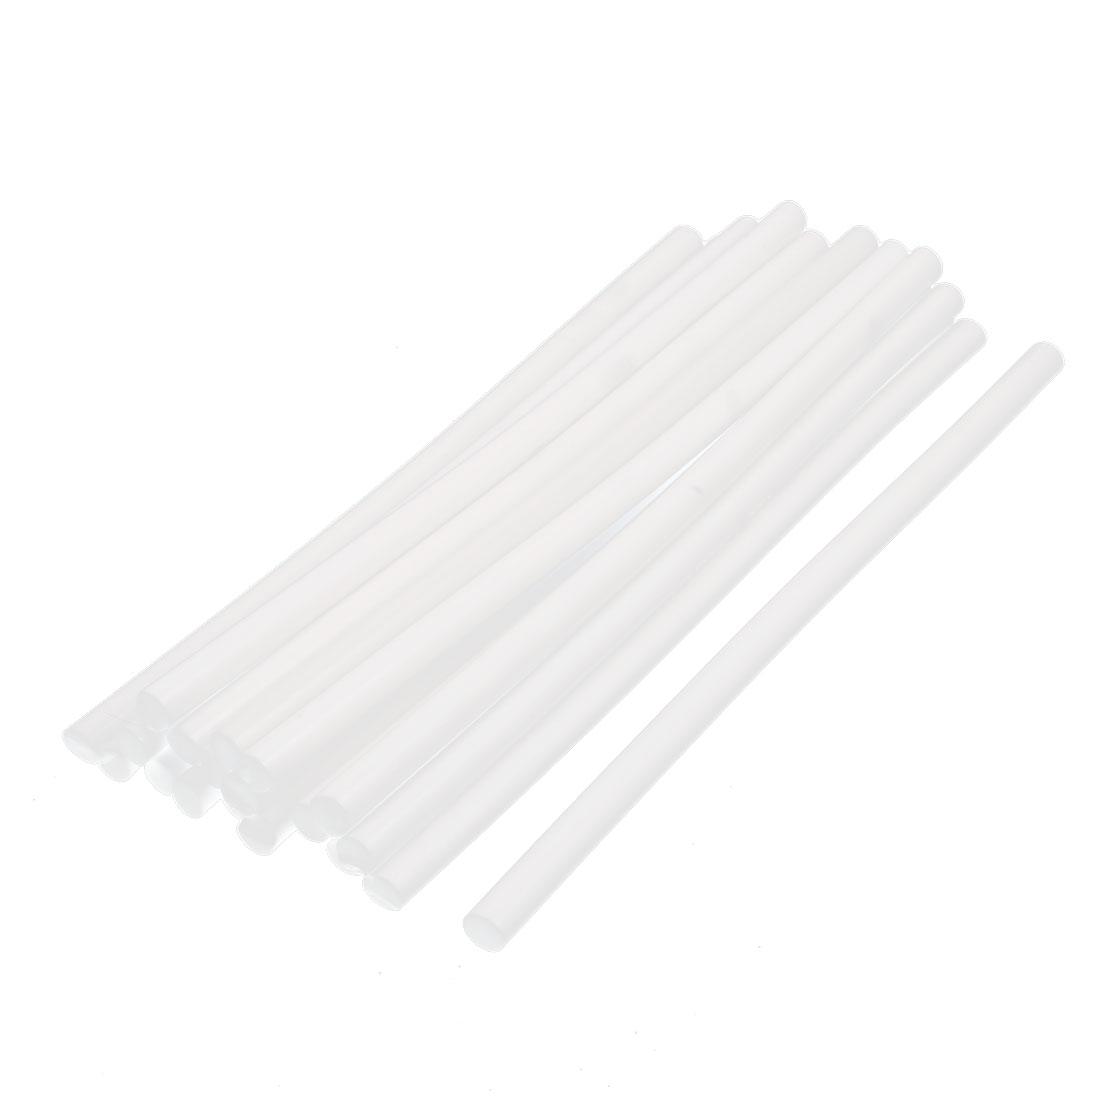 20 Pcs 11mm Dia. 30cm Length Crafting Model Hot Melt Glue Stick Milky White